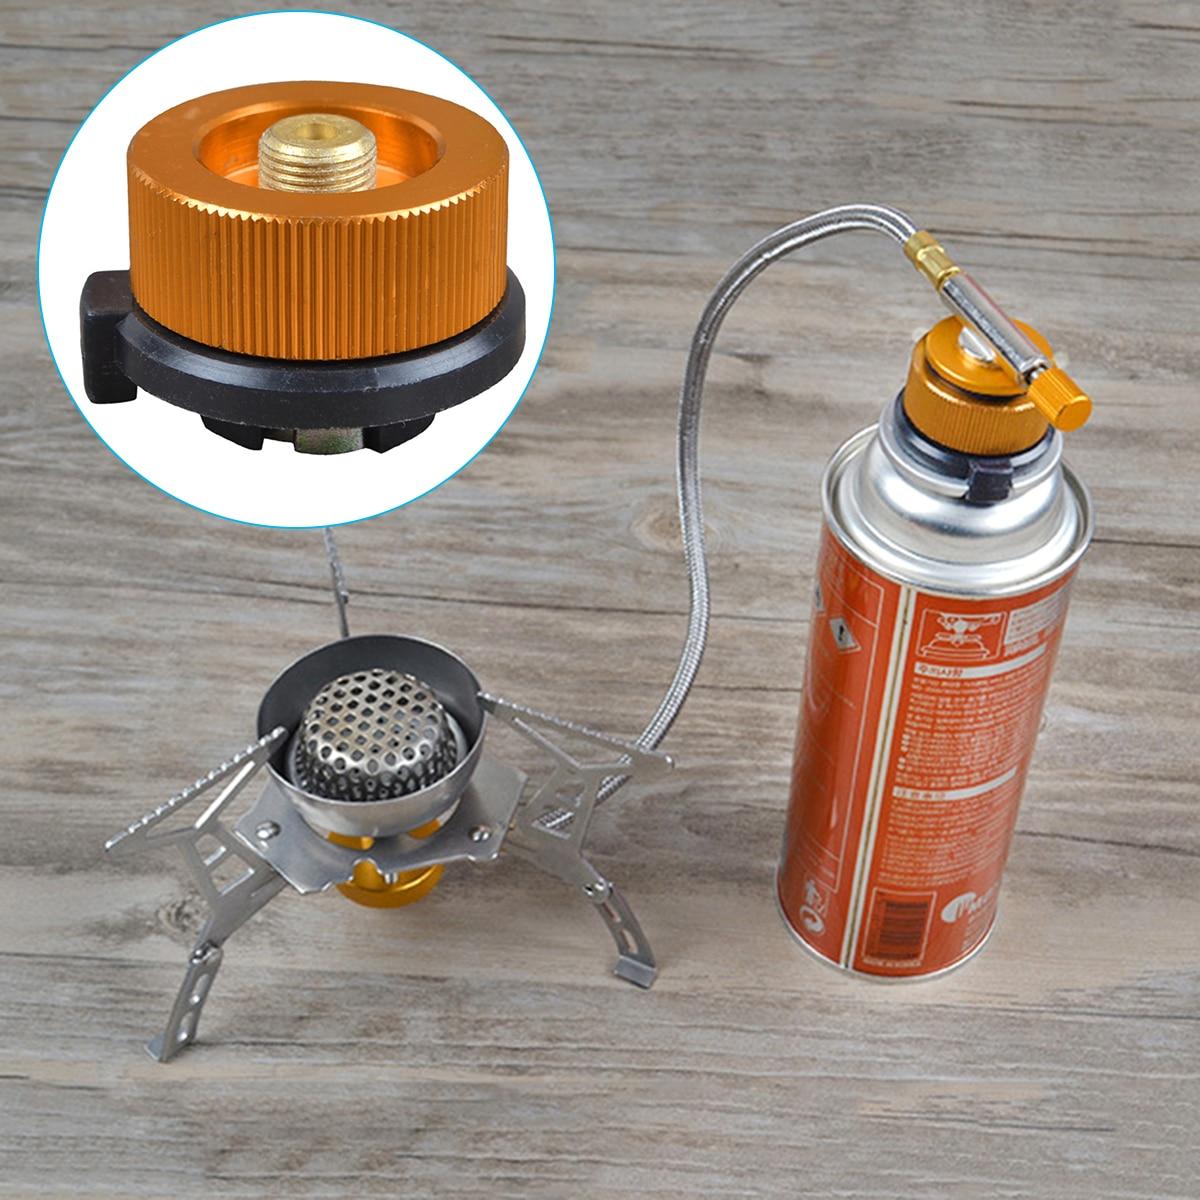 Outdoor Camping Gas Stove Adapter Tank Propane Refill Coupler Adaptor Gas